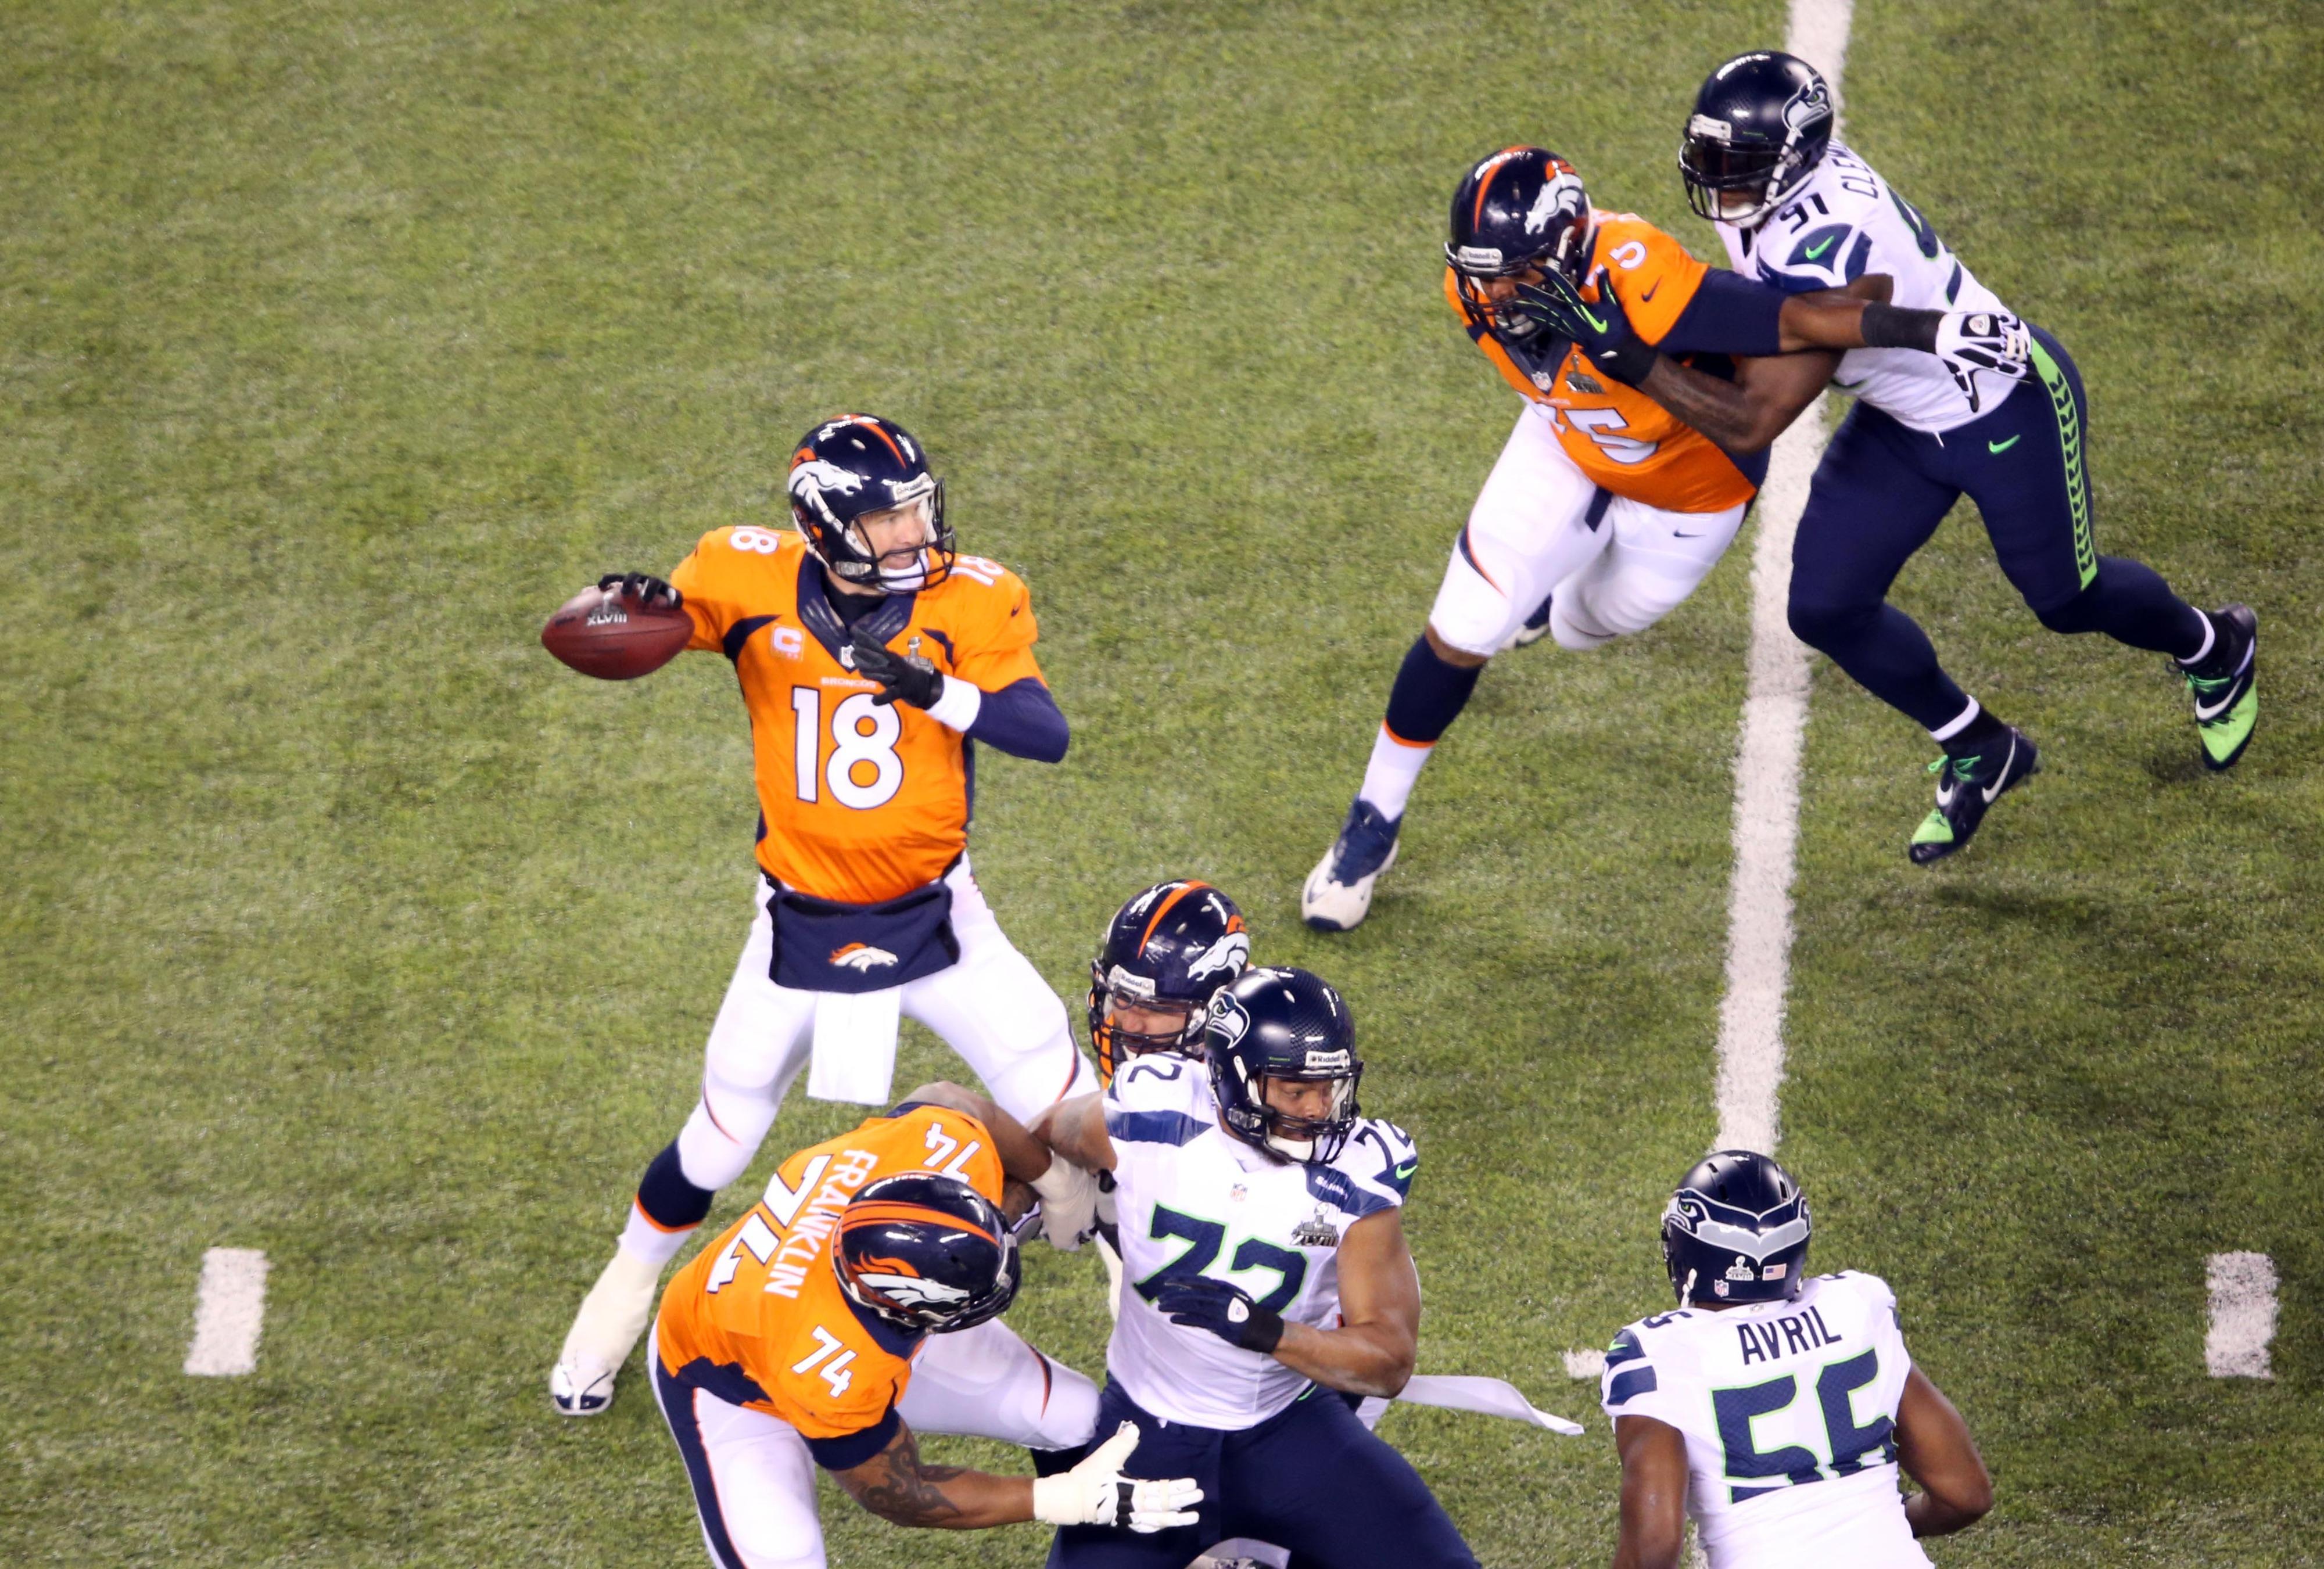 Super Bowl 48, score update: Peyton Manning throws pick-6, Seahawks lead 22-0